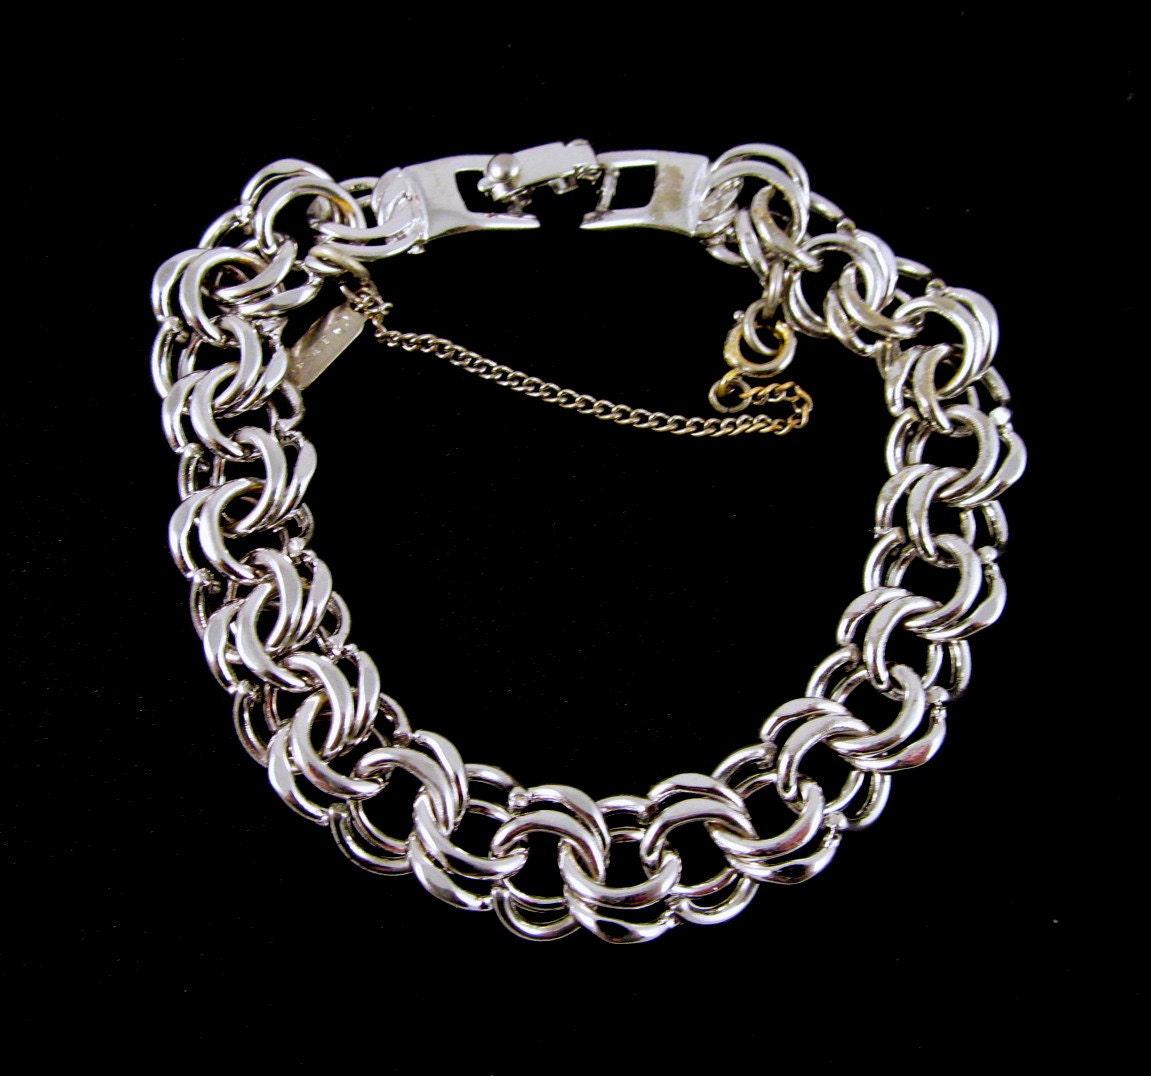 silver tone monet chanette charm bracelet 1960s